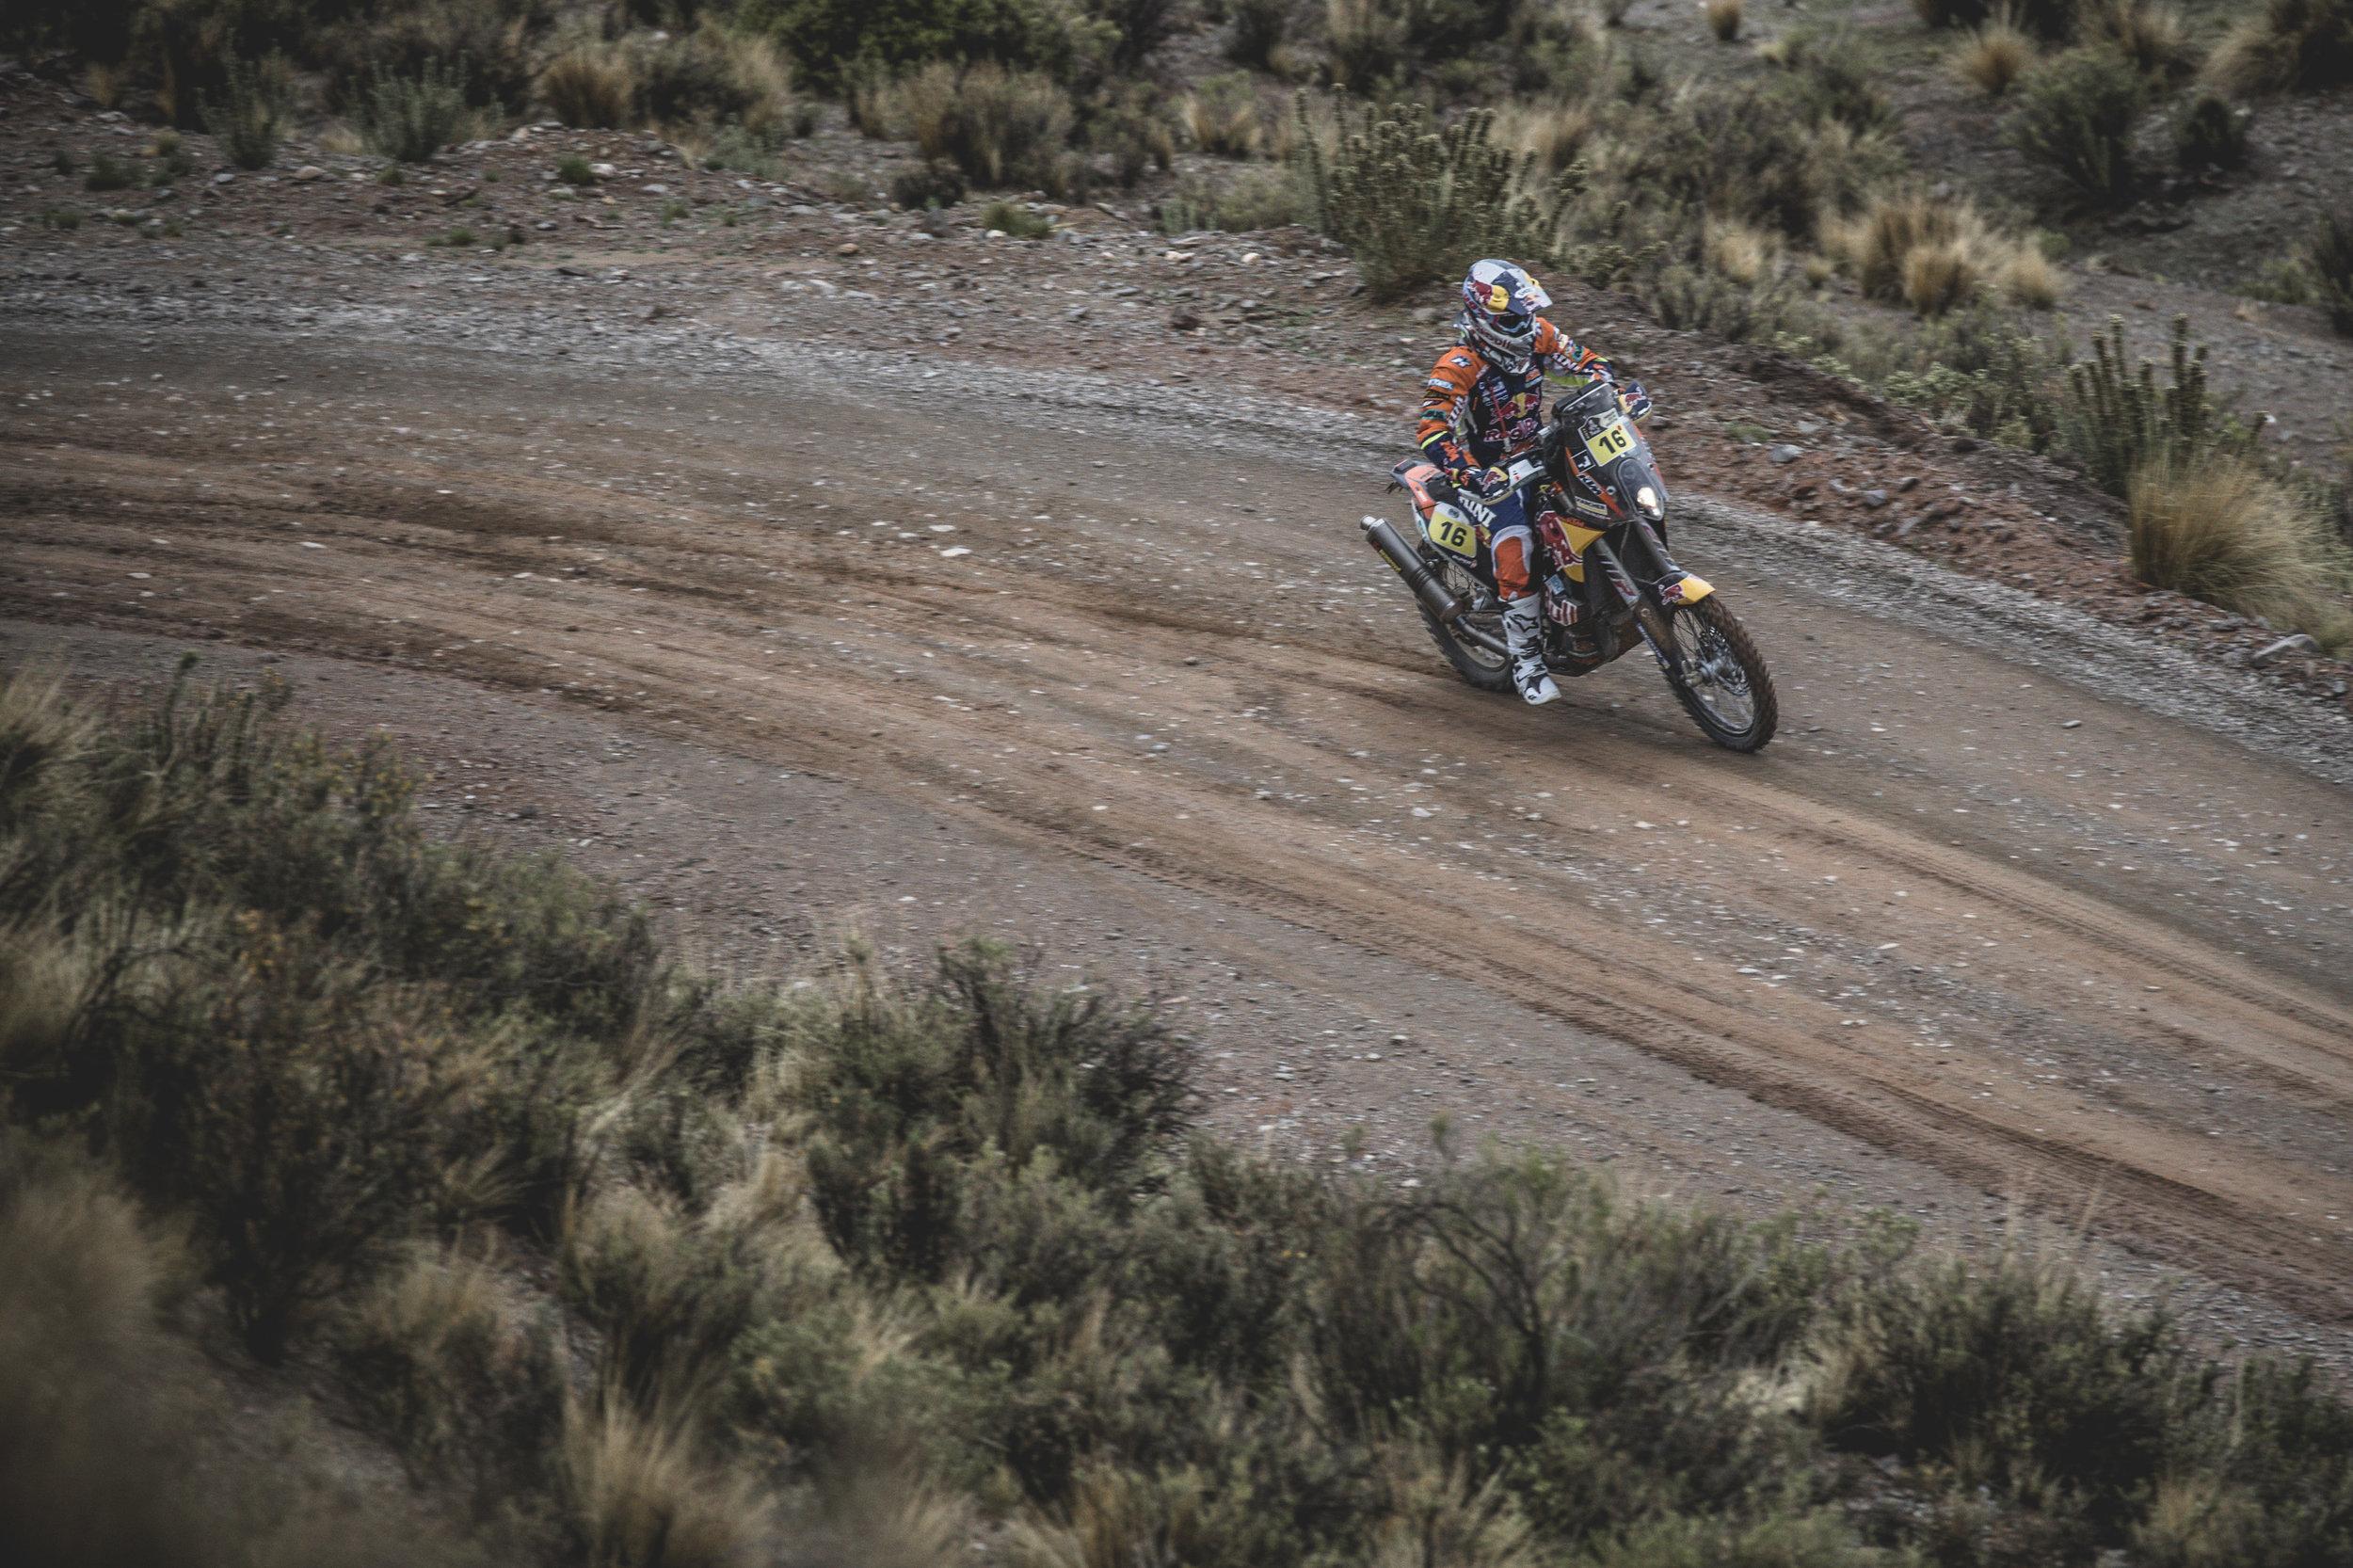 Matthias Walkner KTM 450 RALLY Dakar 2017.jpg